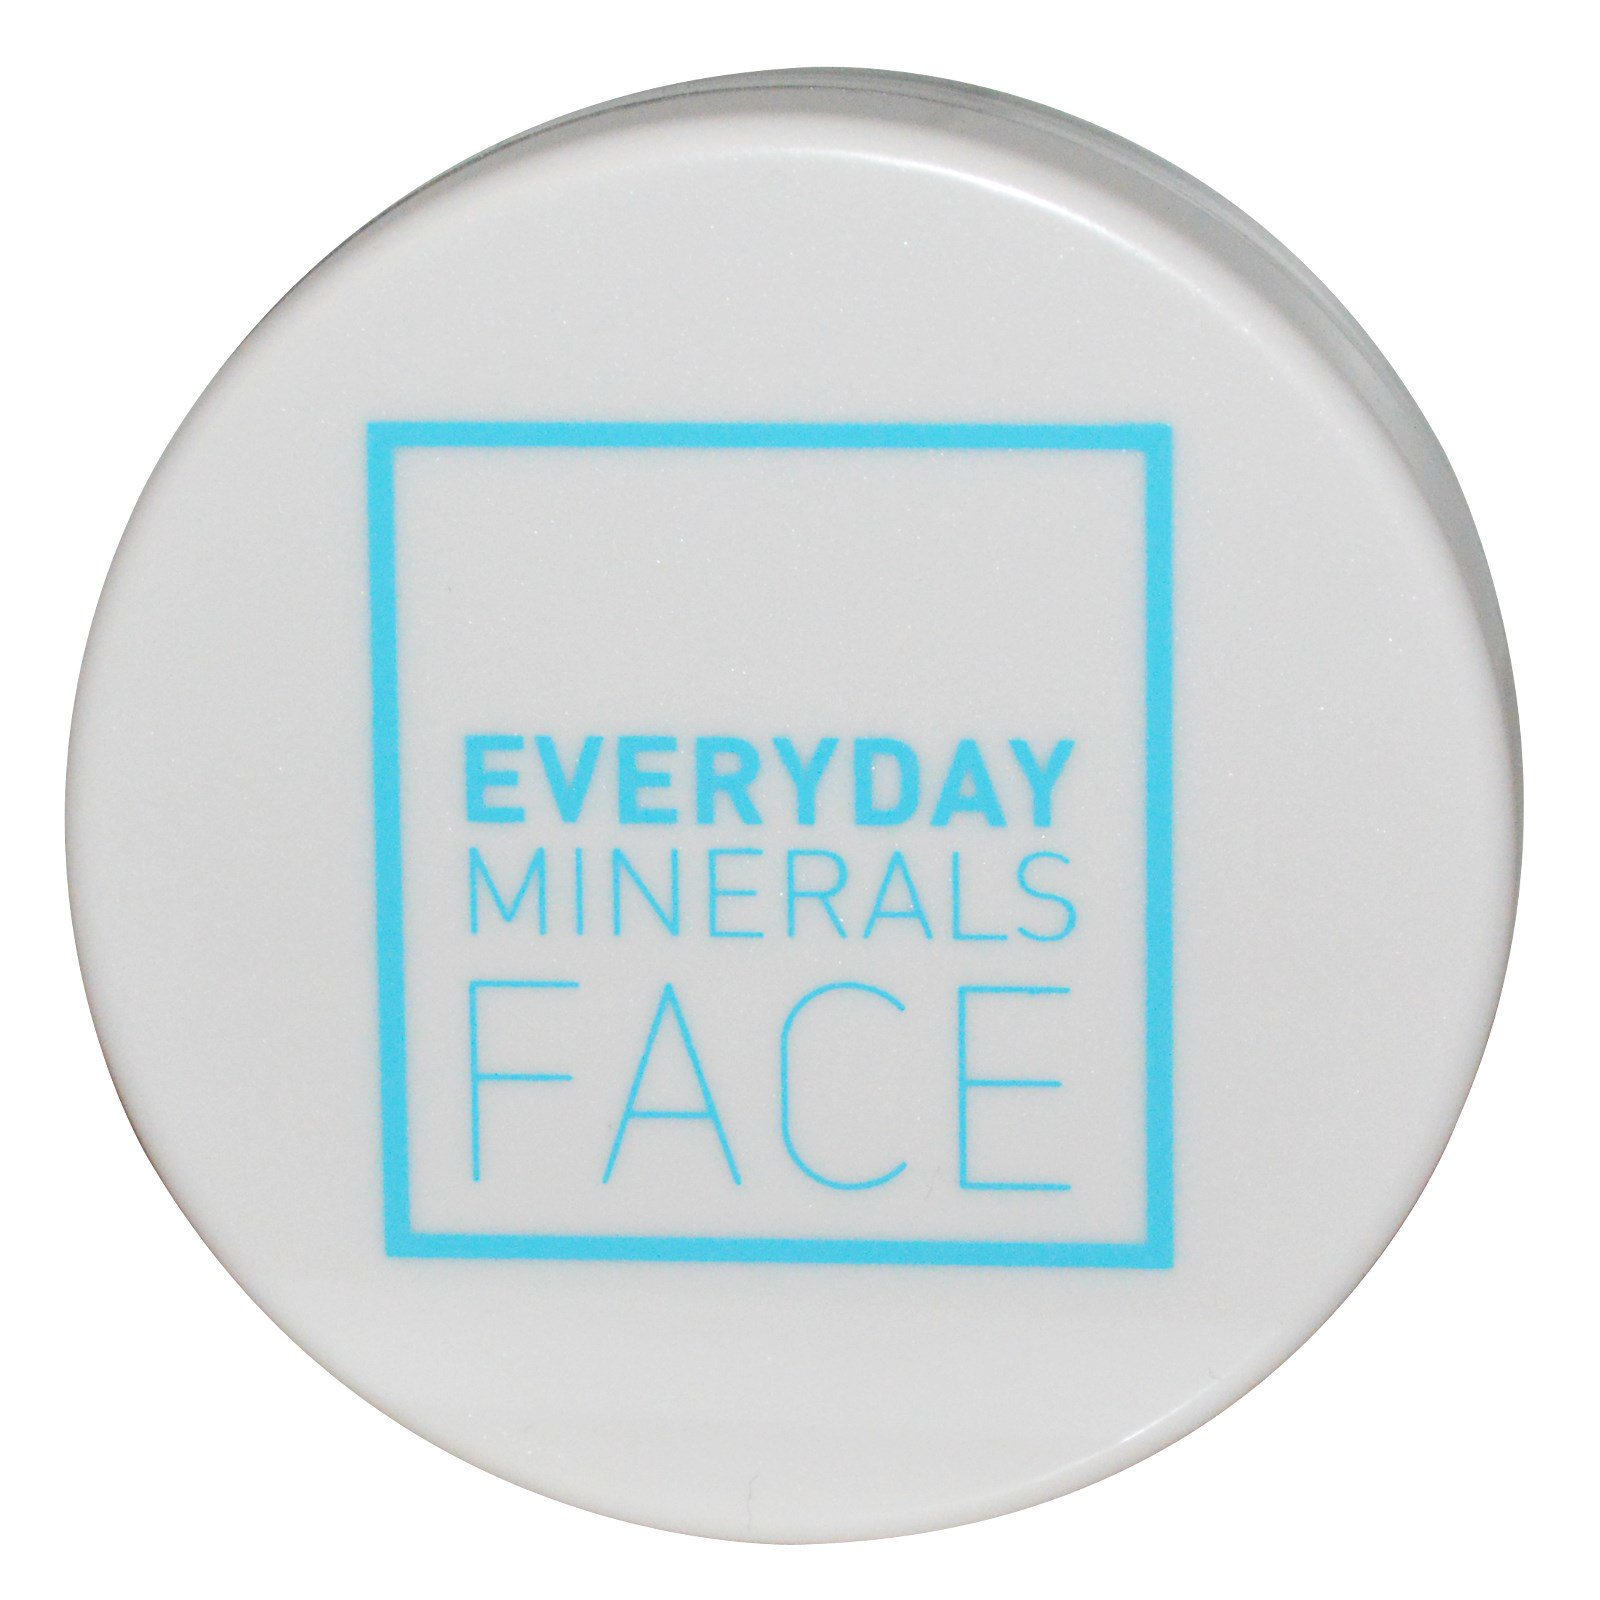 Everydau minerals FACE